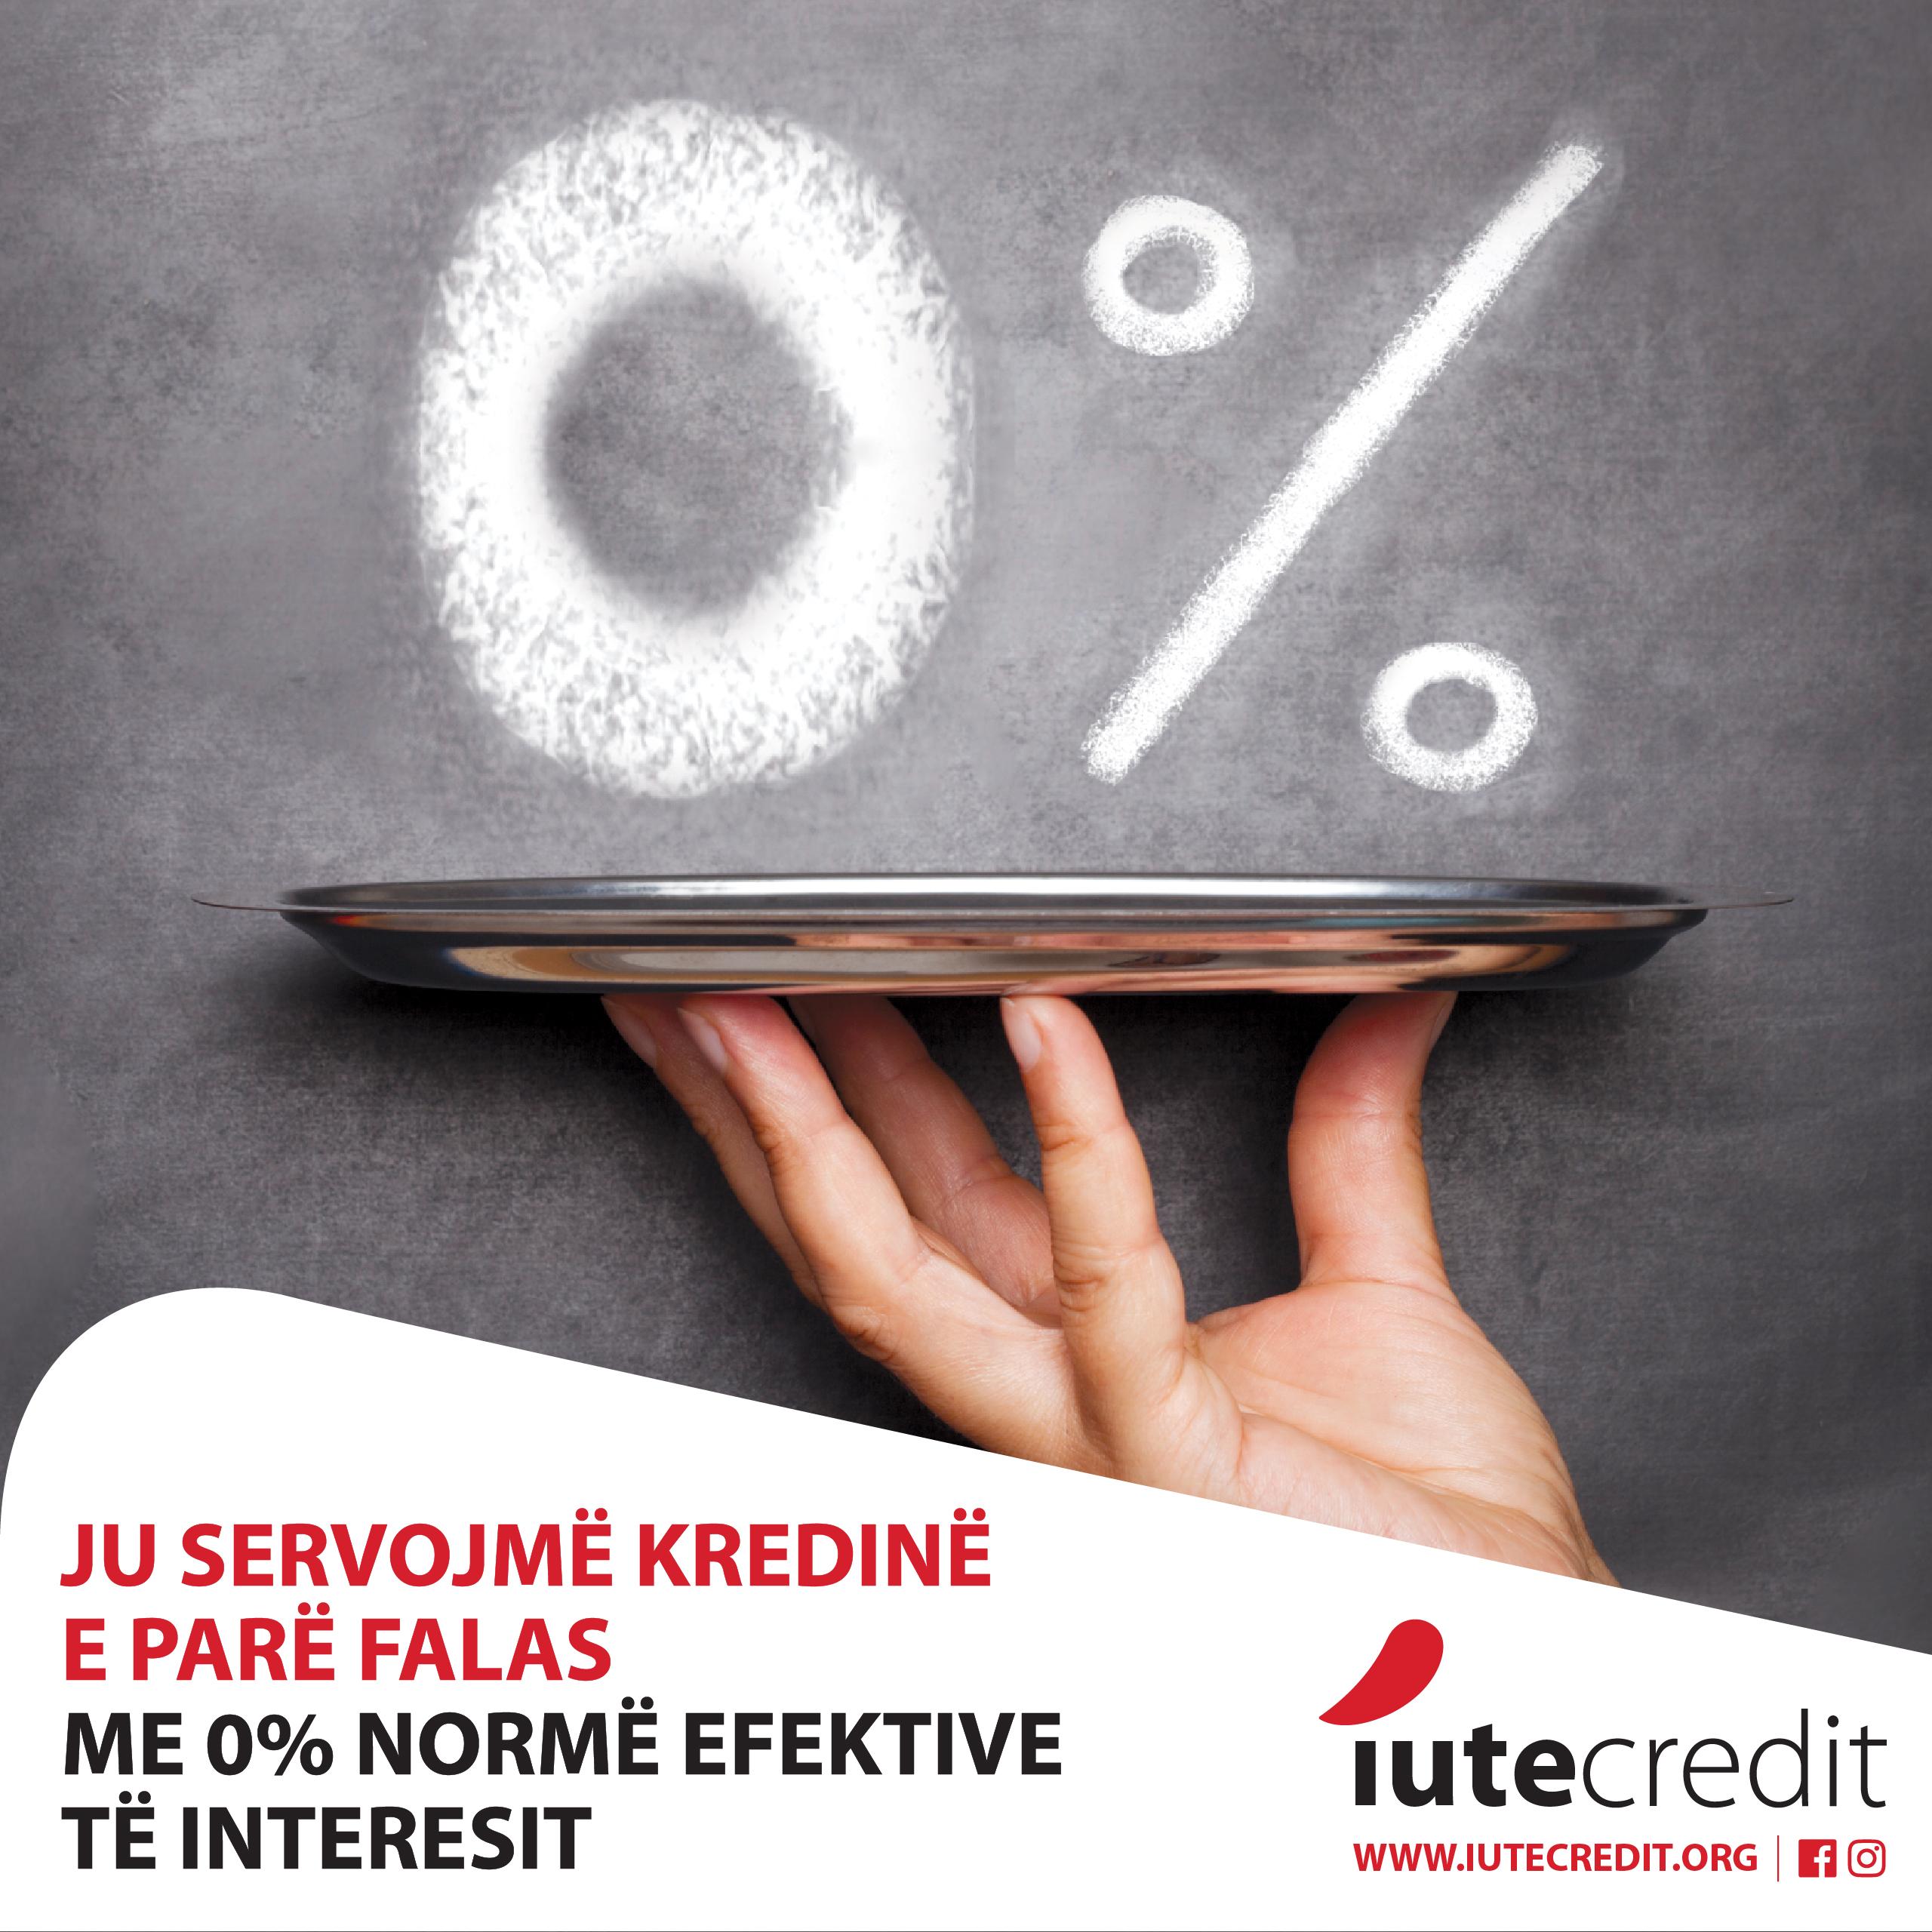 Iute Credit Project Img 9 - Vatra Agency / Founder & CEO Gerton Bejo